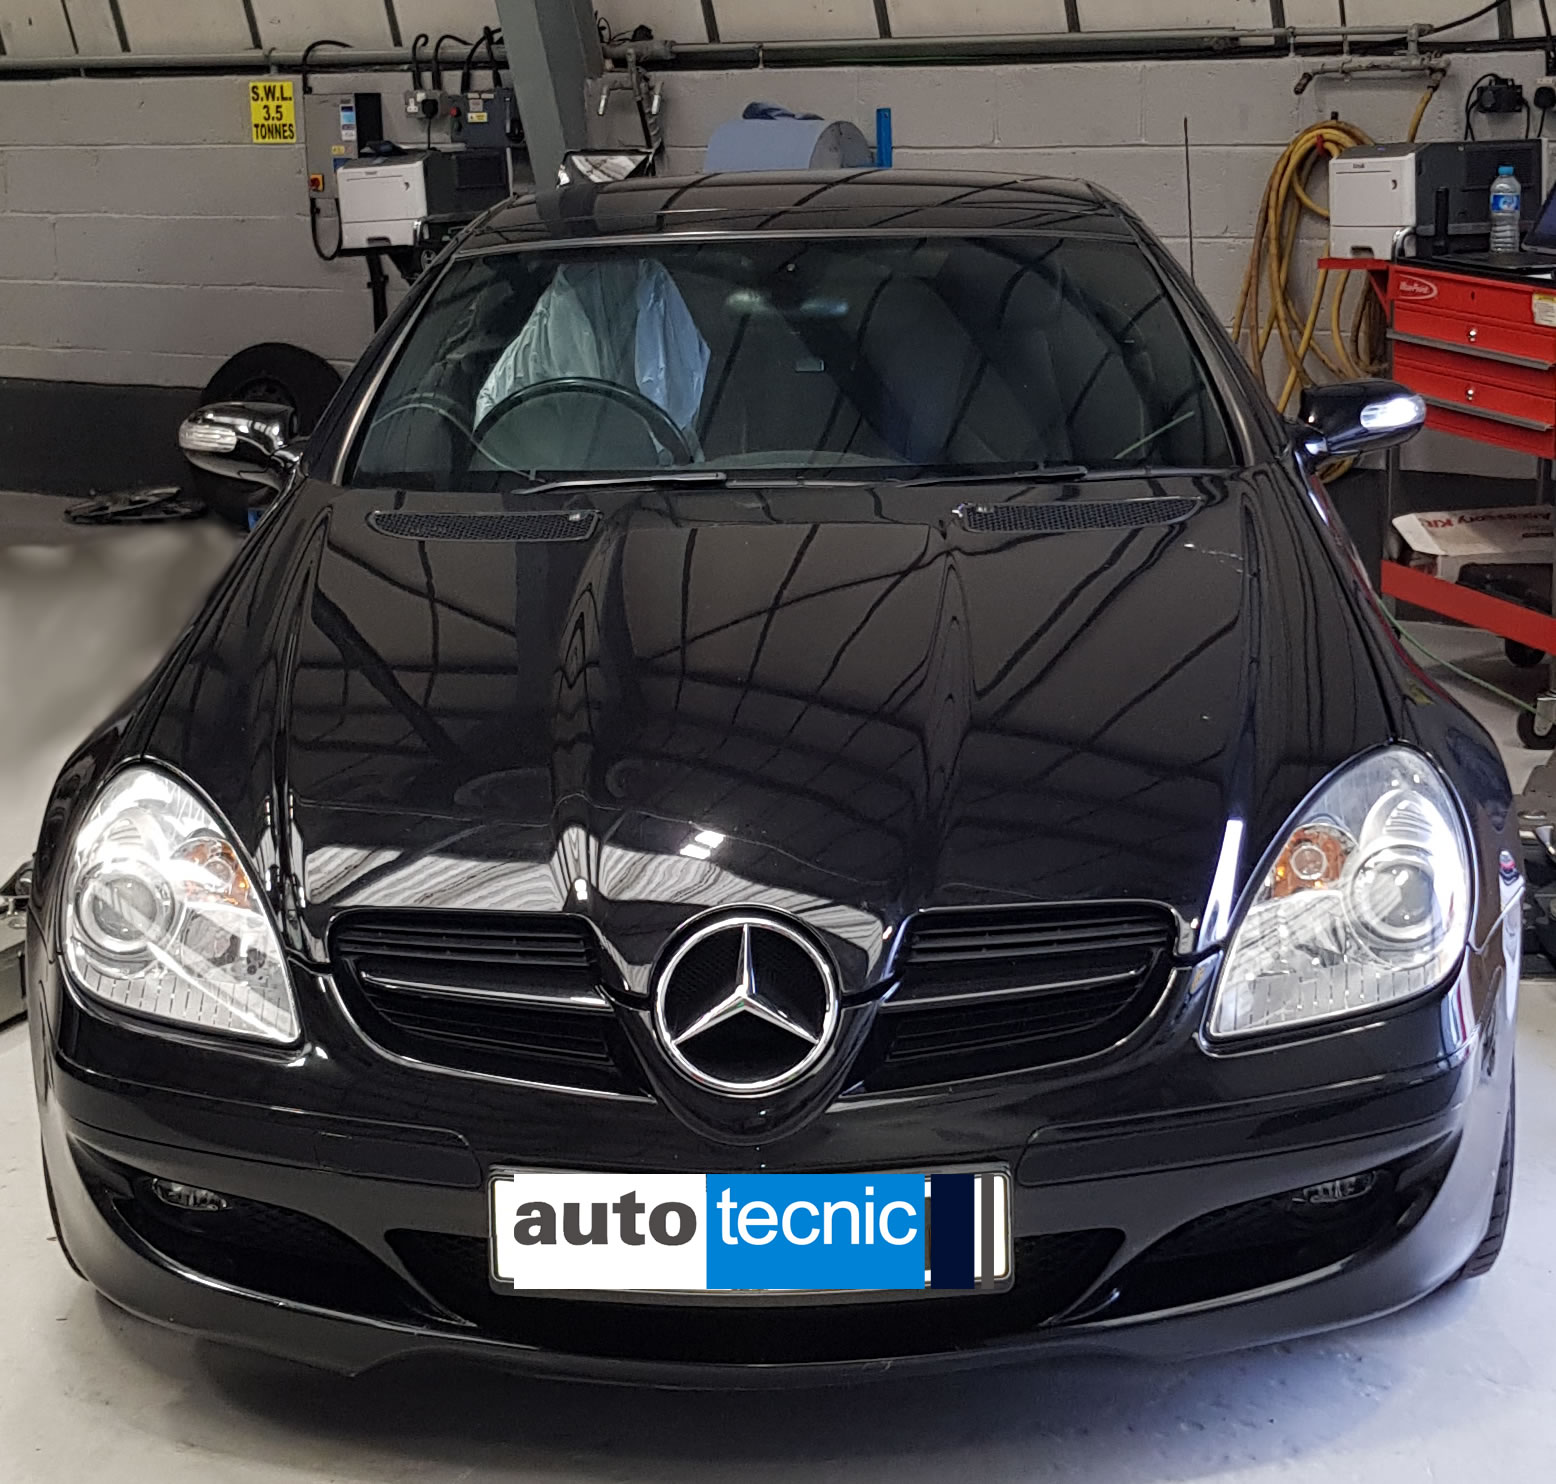 autotecnic - workshop - Mercedes